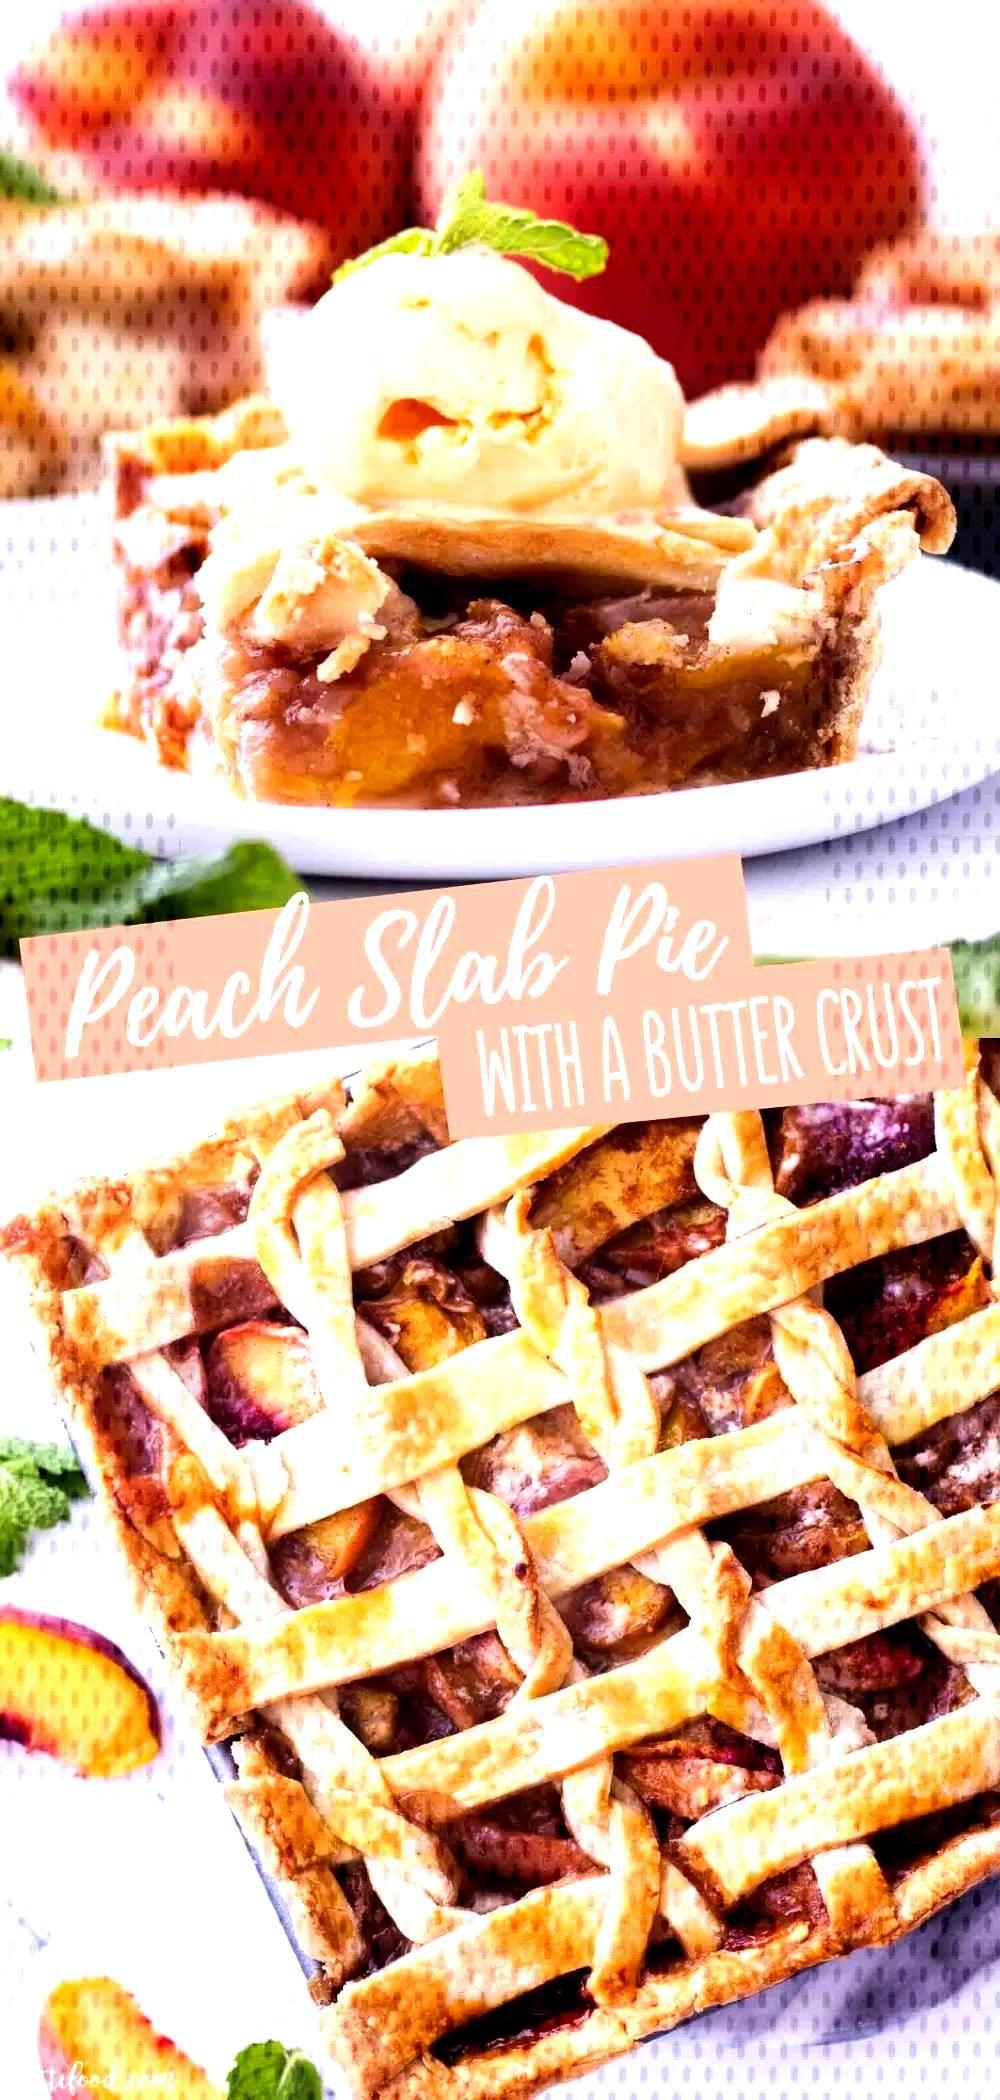 Easy Peach Slab Pie - Desserts Bread Puddings, Cobblers, Custards, Cookies, Pies, etc.! -